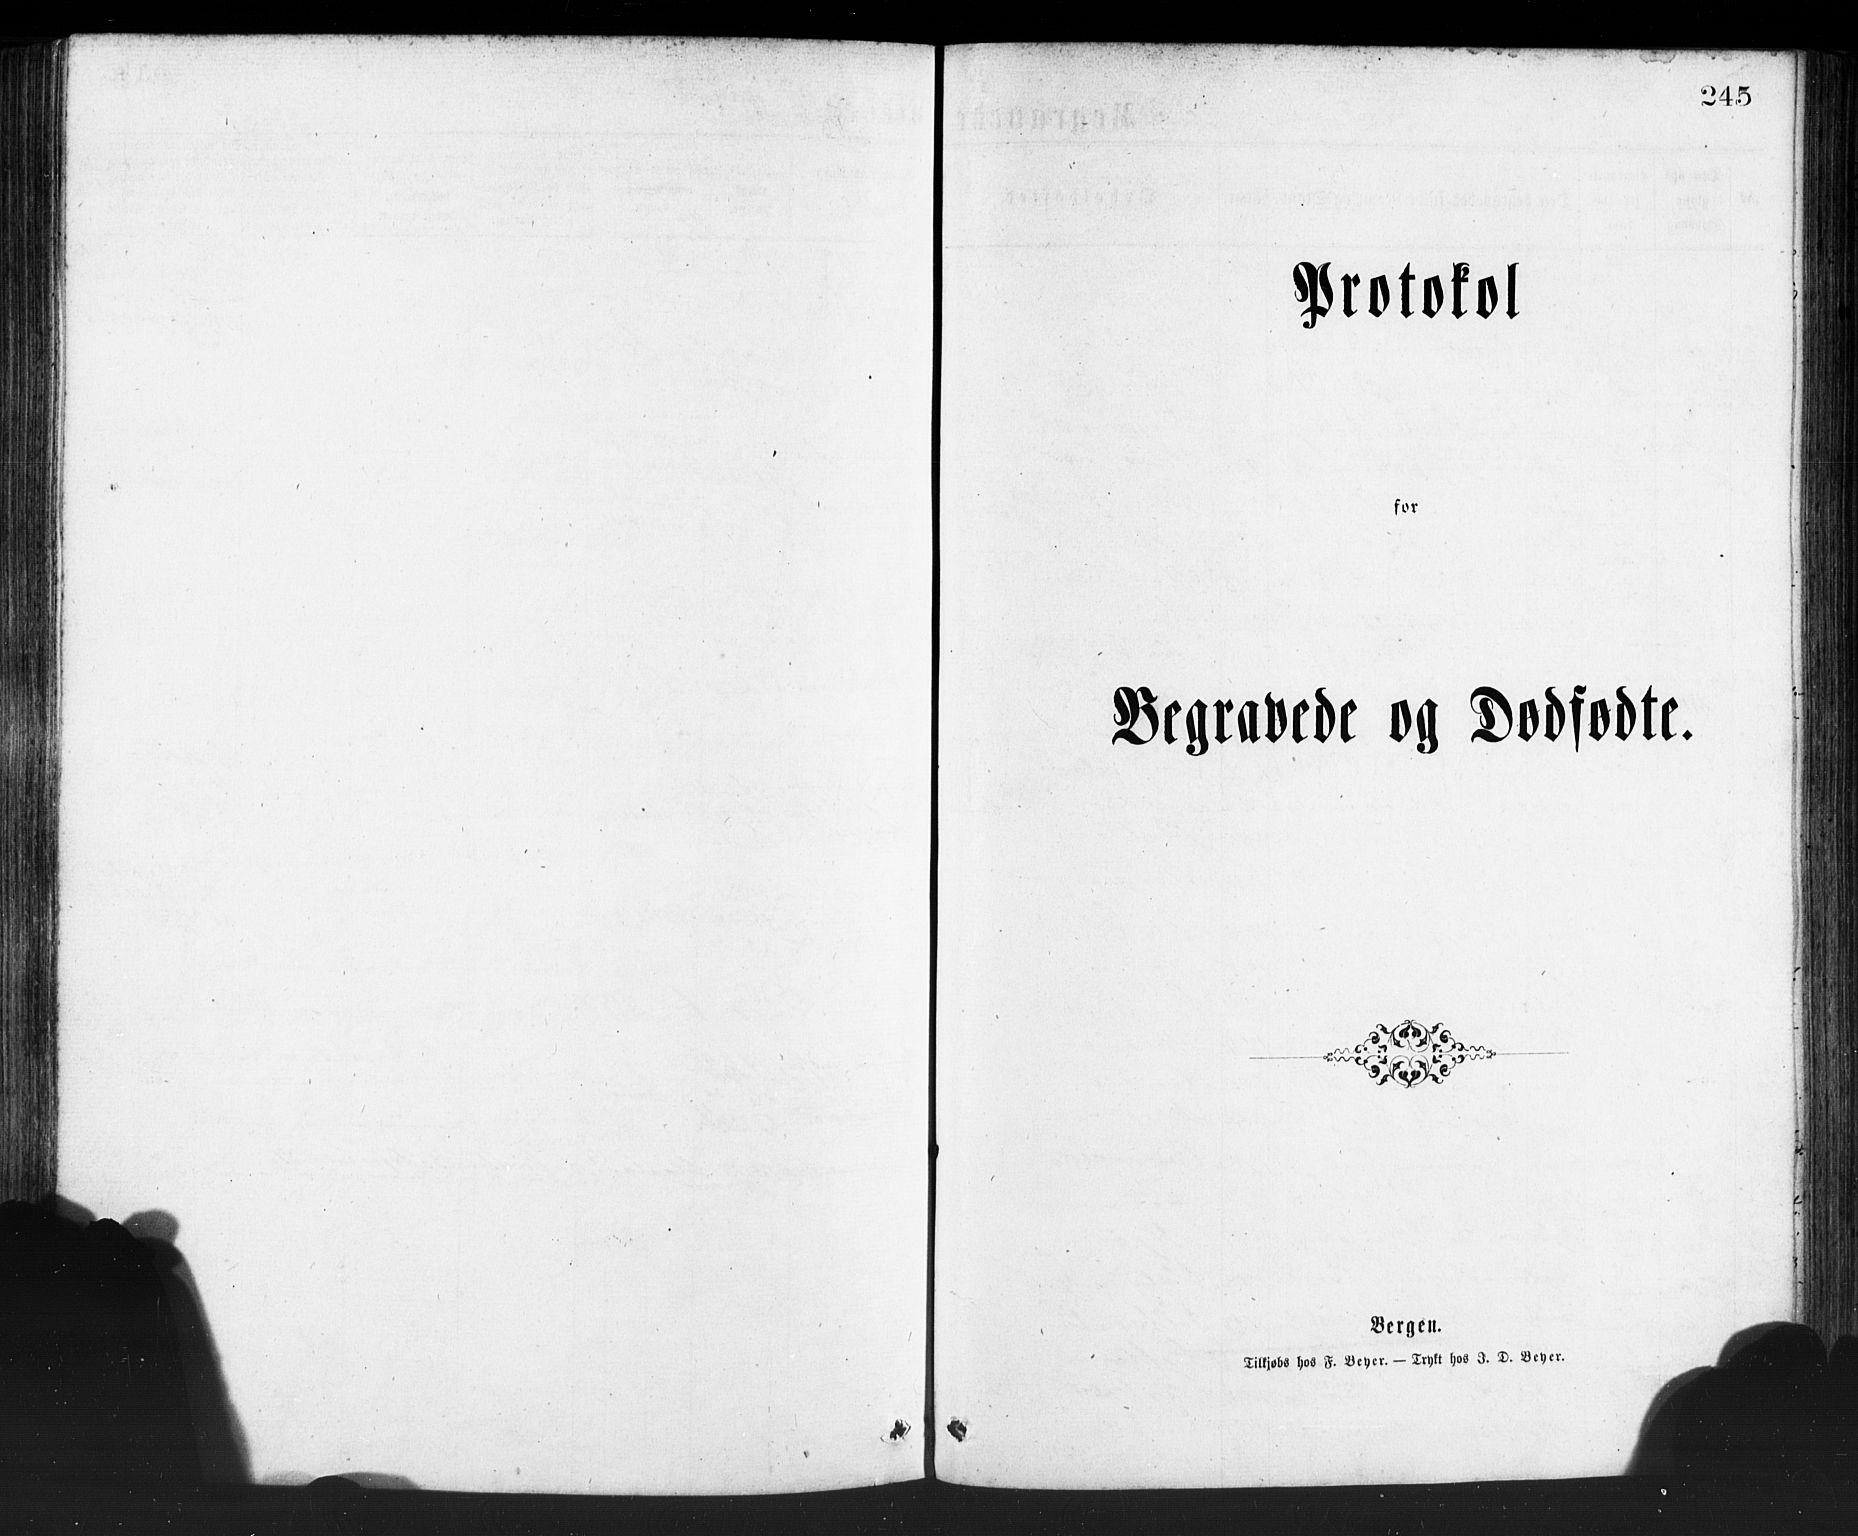 SAB, Manger sokneprestembete, H/Haa: Ministerialbok nr. A 8, 1871-1880, s. 245